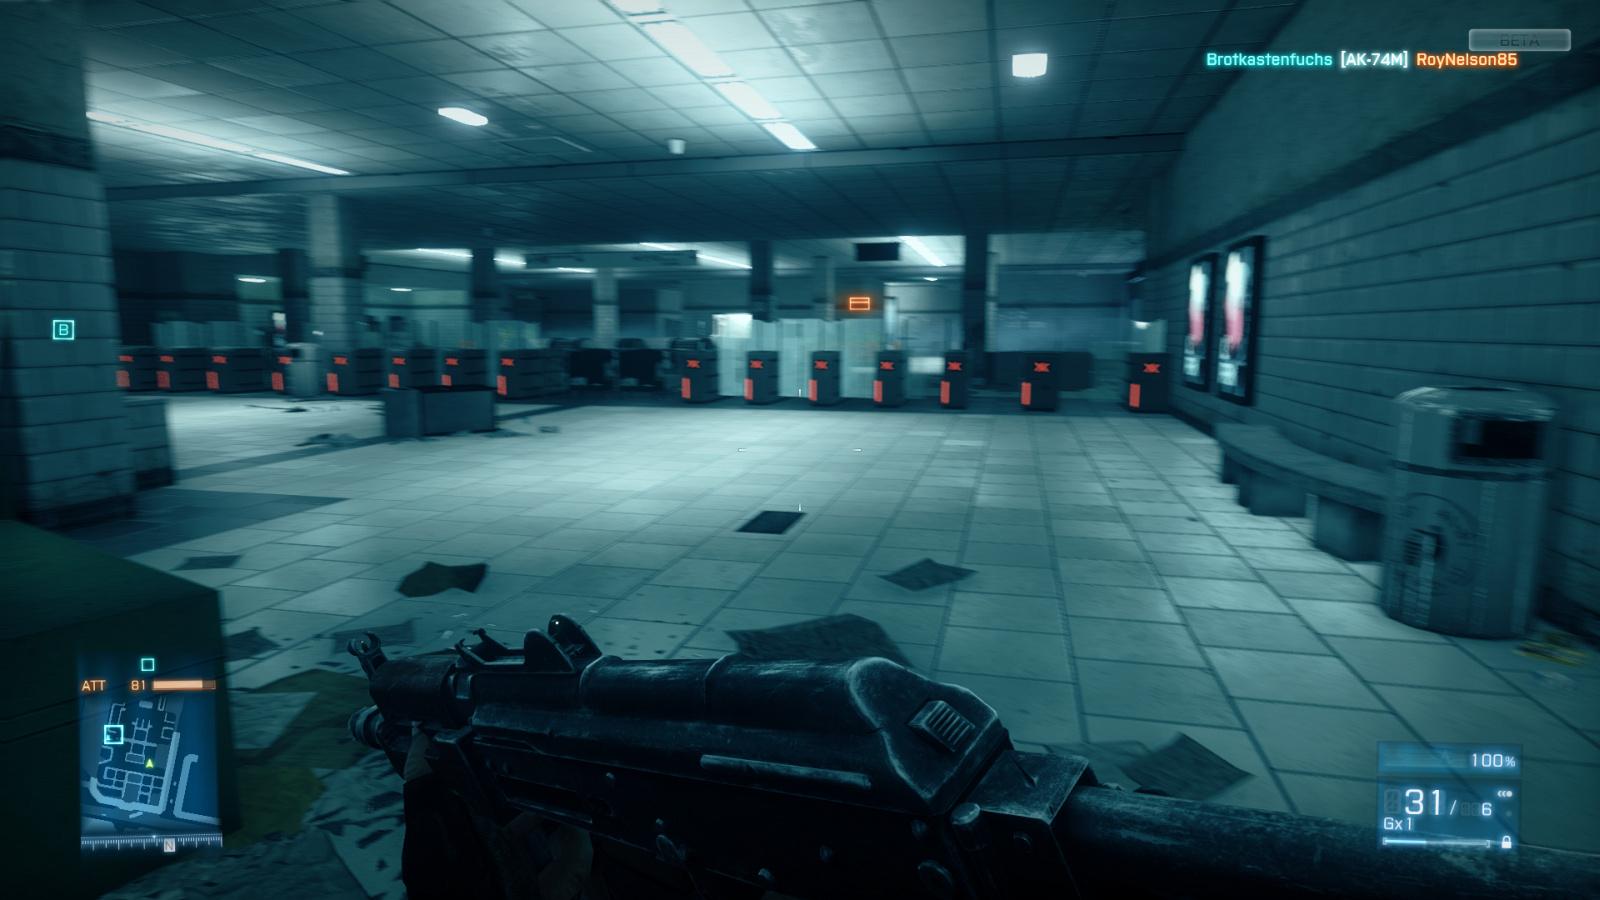 Beta Battlefieldu 3 je live – hratelnost, grafika, galerie 52427